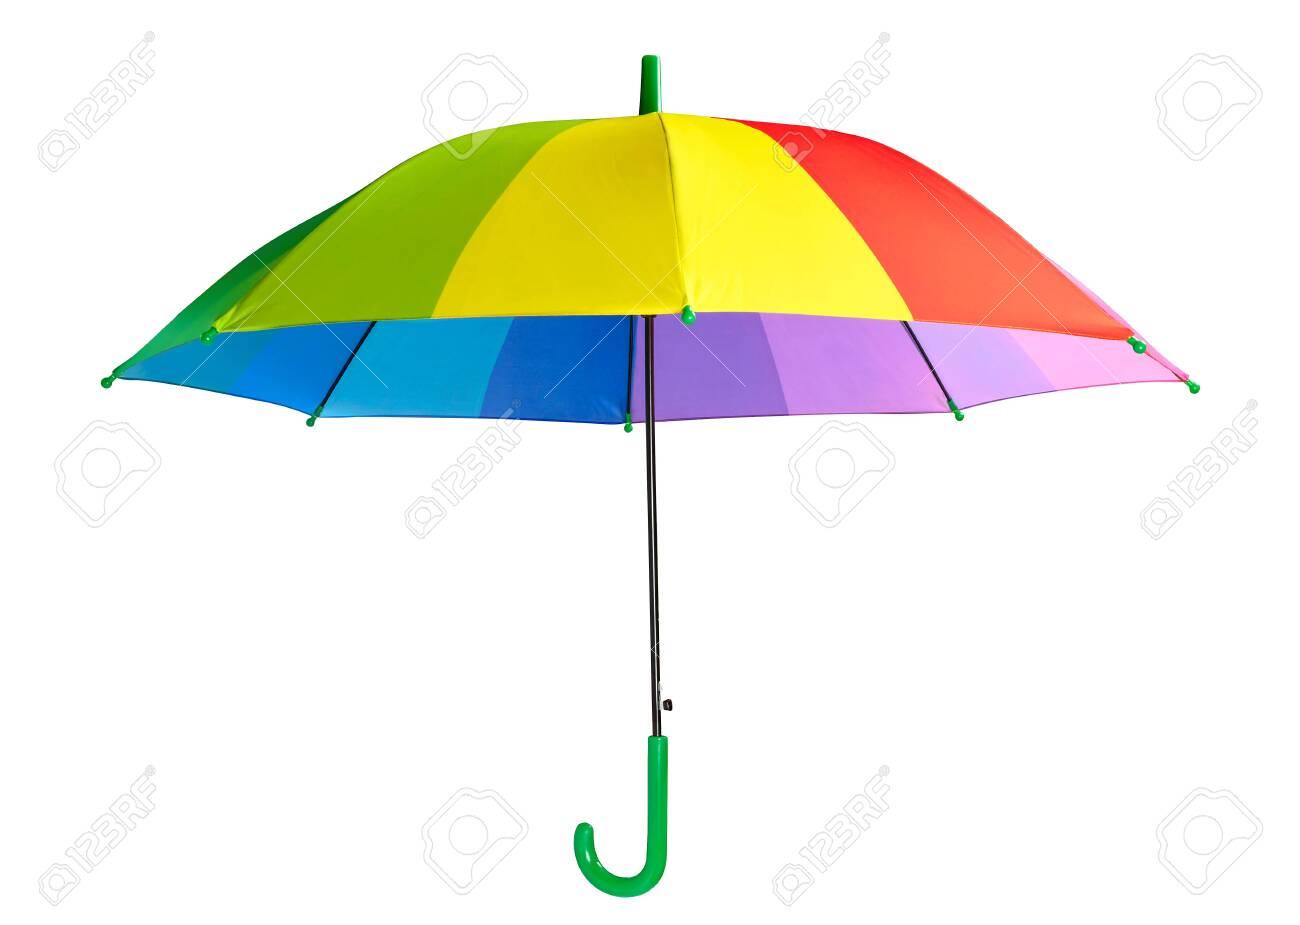 Multicolored umbrella isolated on the white background - 157021439